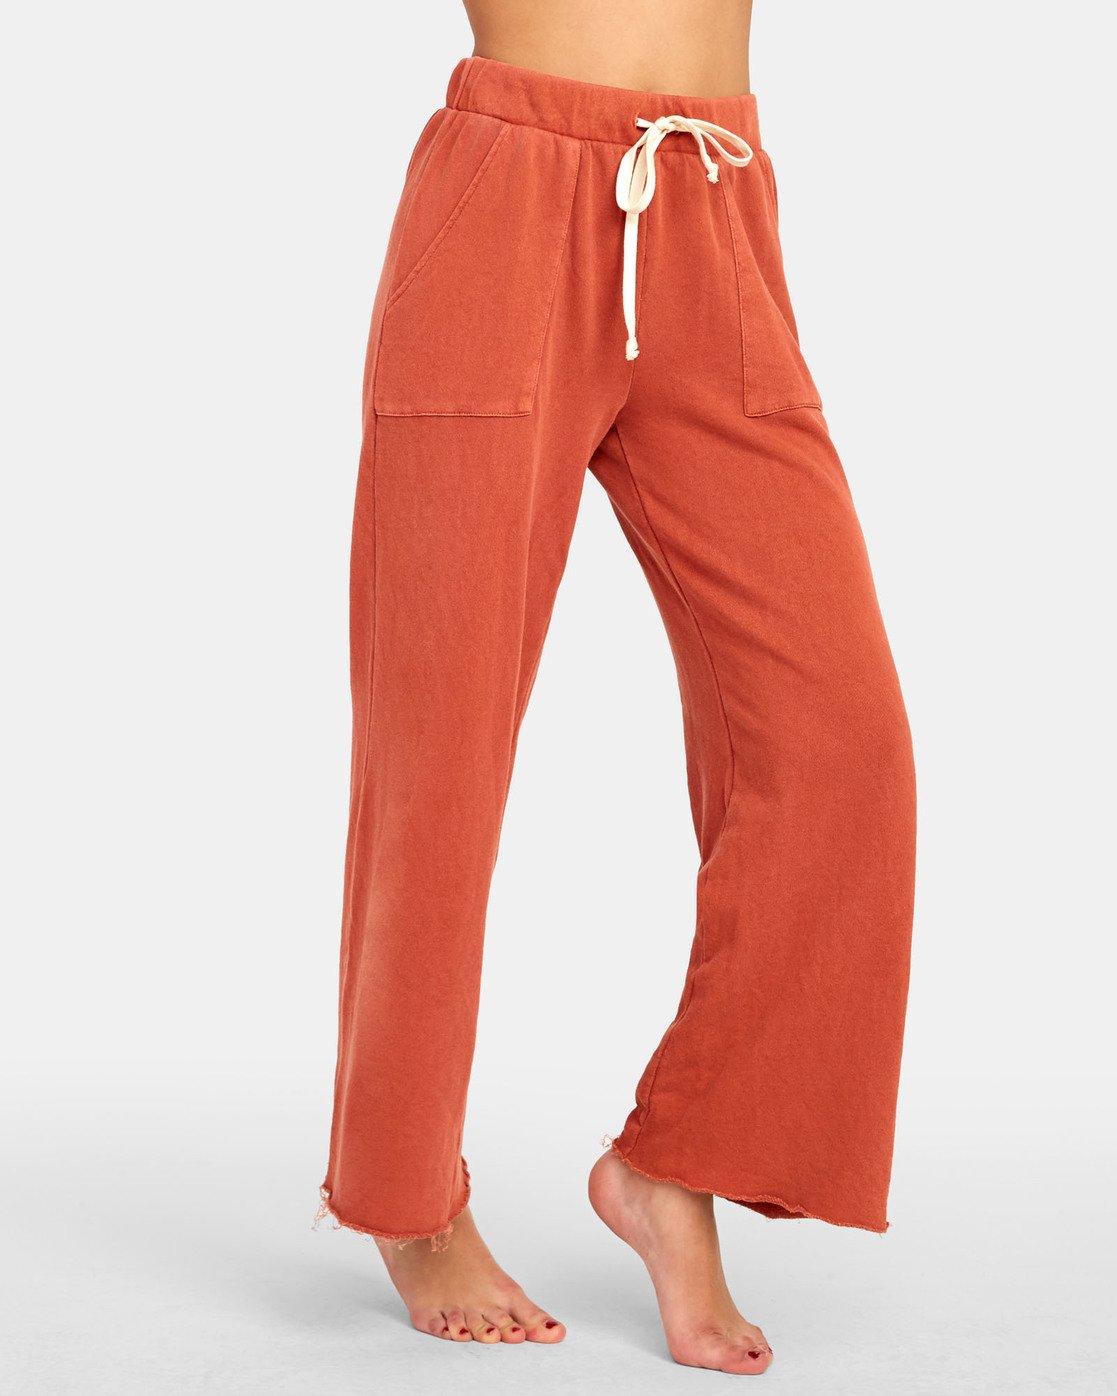 7 PEPPER WIDE LEG FLEECE PANT Orange WL071RPE RVCA